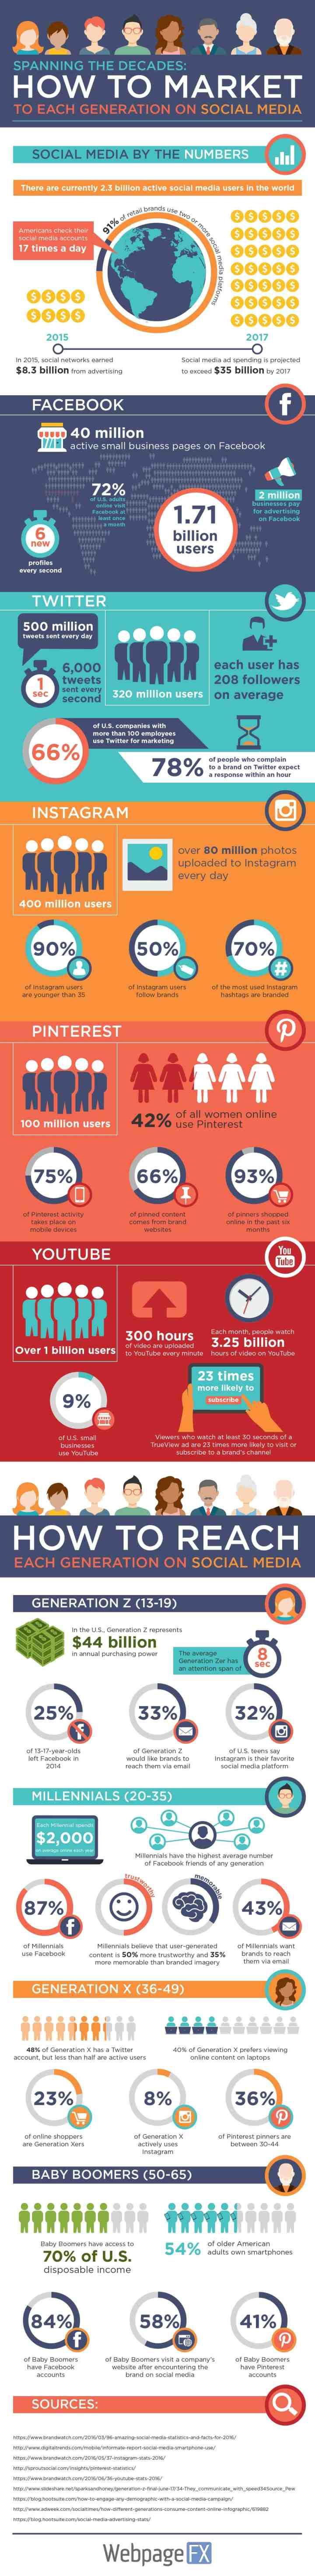 social-media-generation-infographic